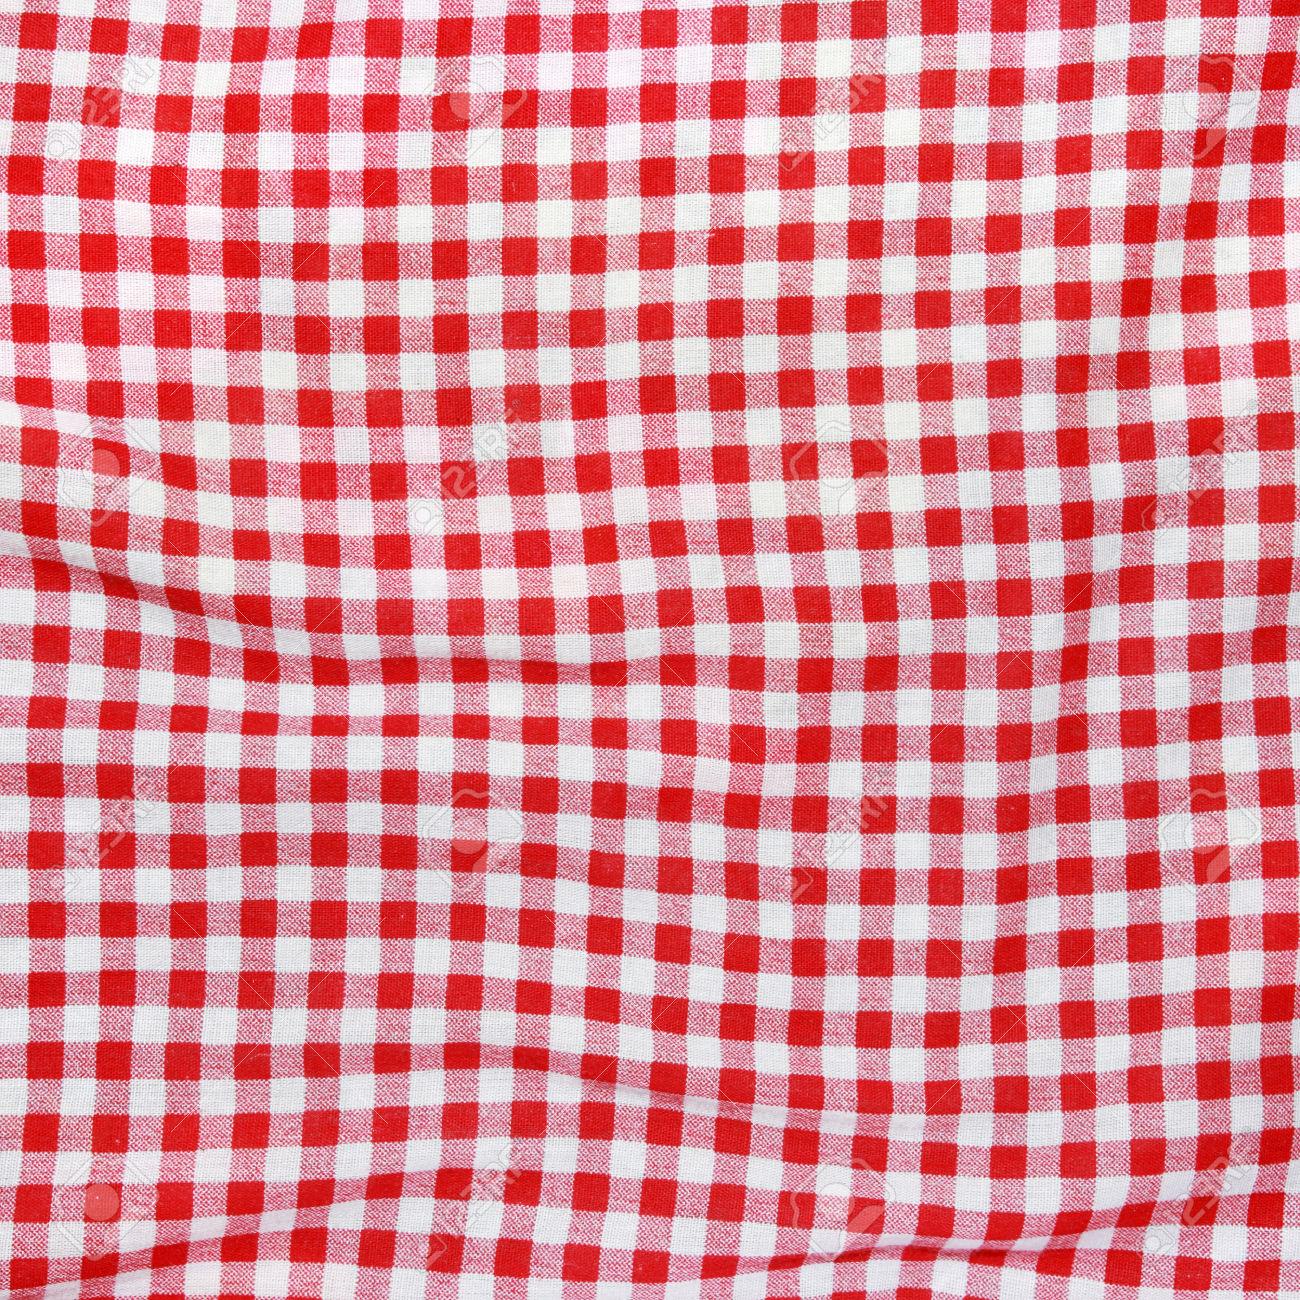 Picnic Blanket: Hudson Bay Blanket